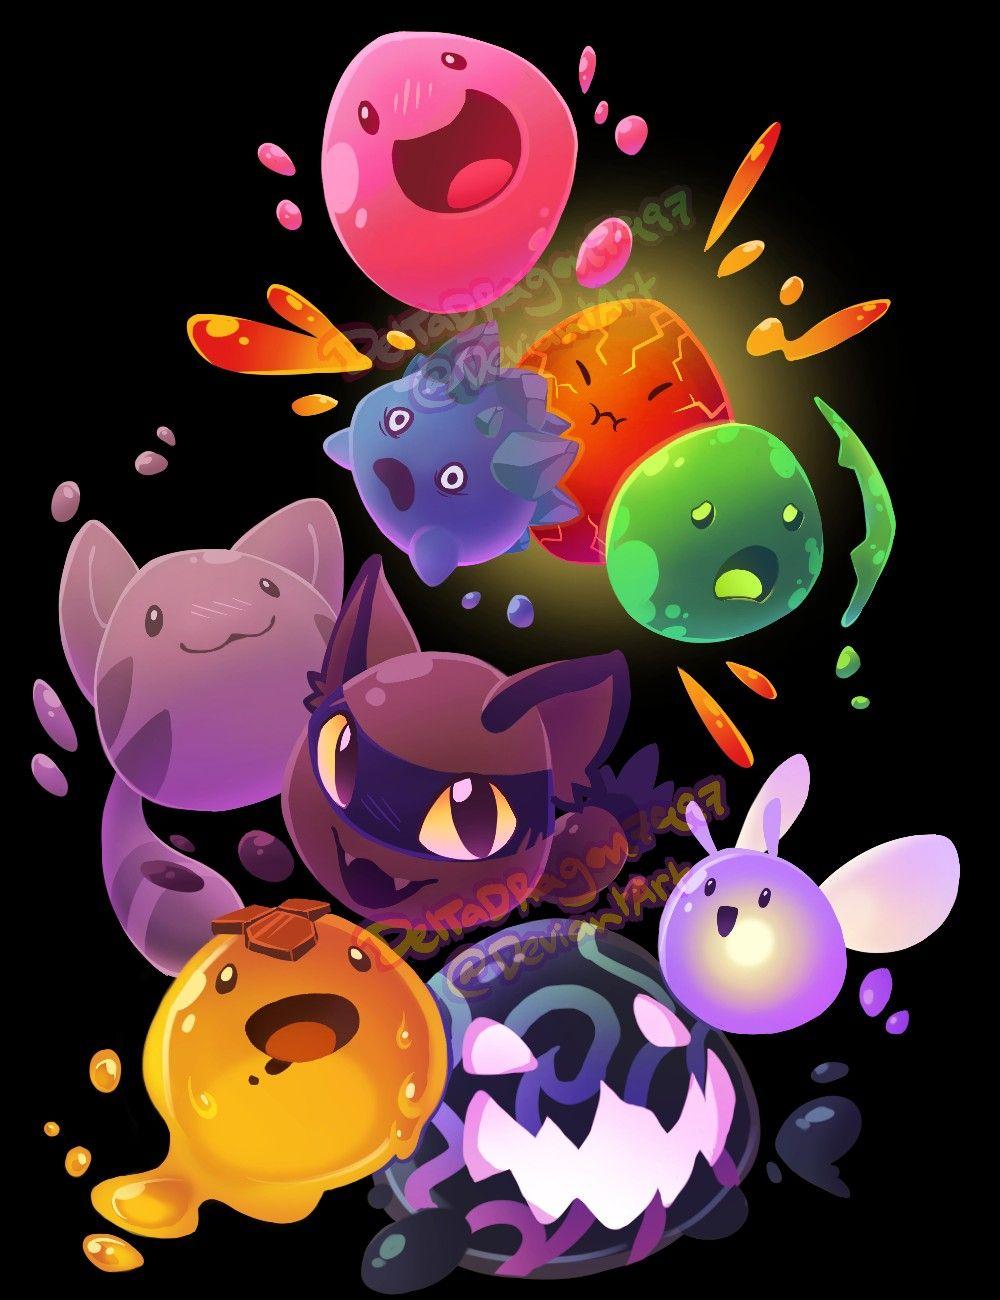 Pin By Melina Morero On Manualidades Ninos Slime Rancher Cute Pokemon Wallpaper Pokemon Eeveelutions